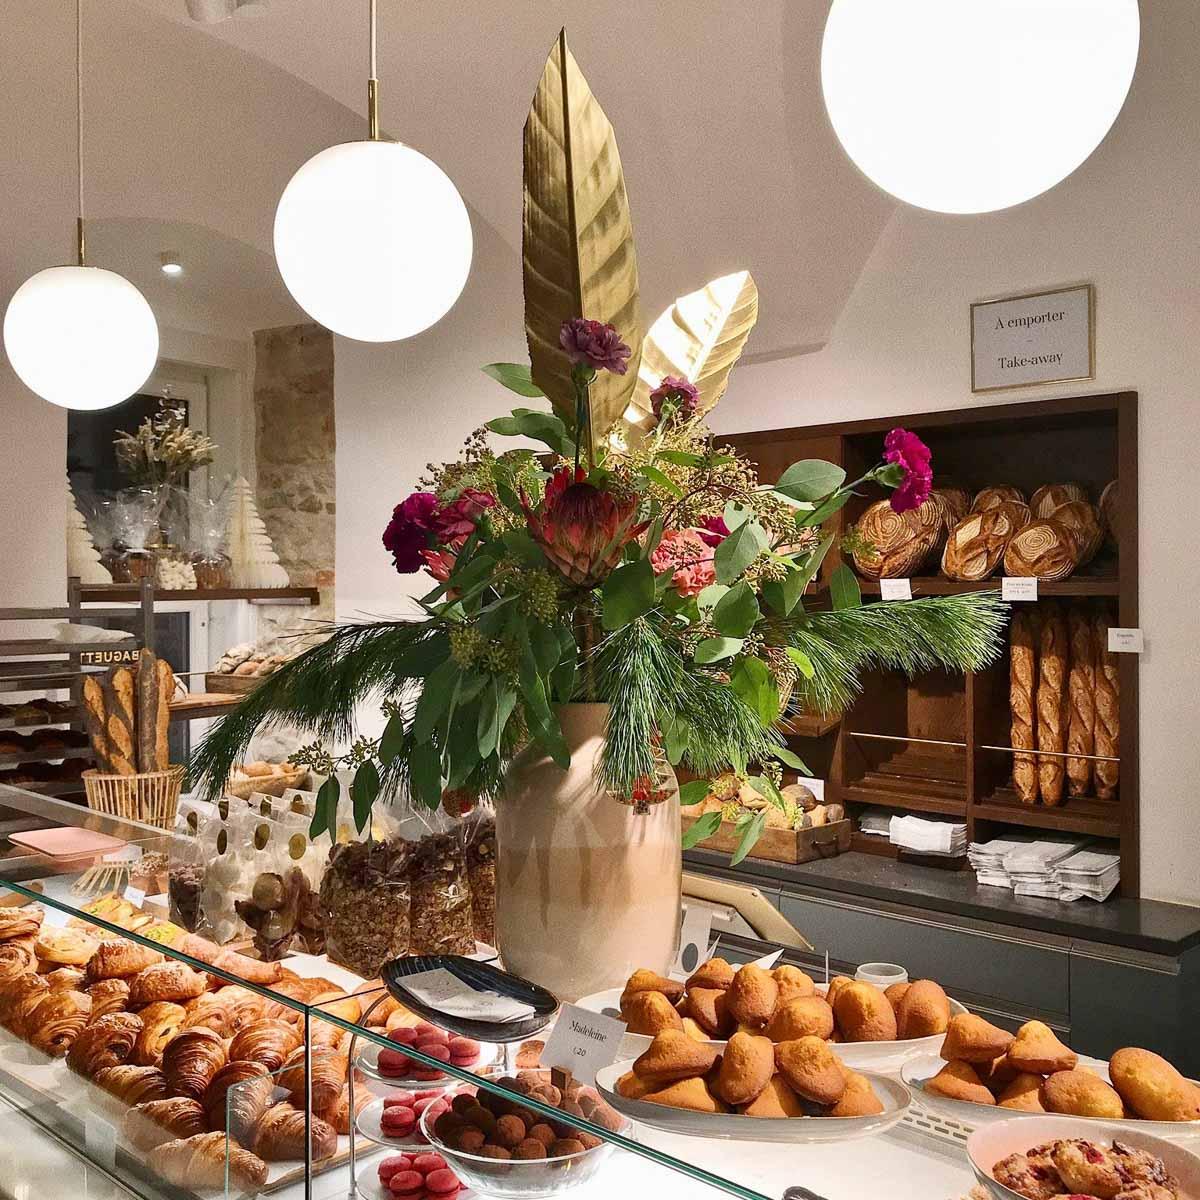 Bäckerei Paremi Wien-8